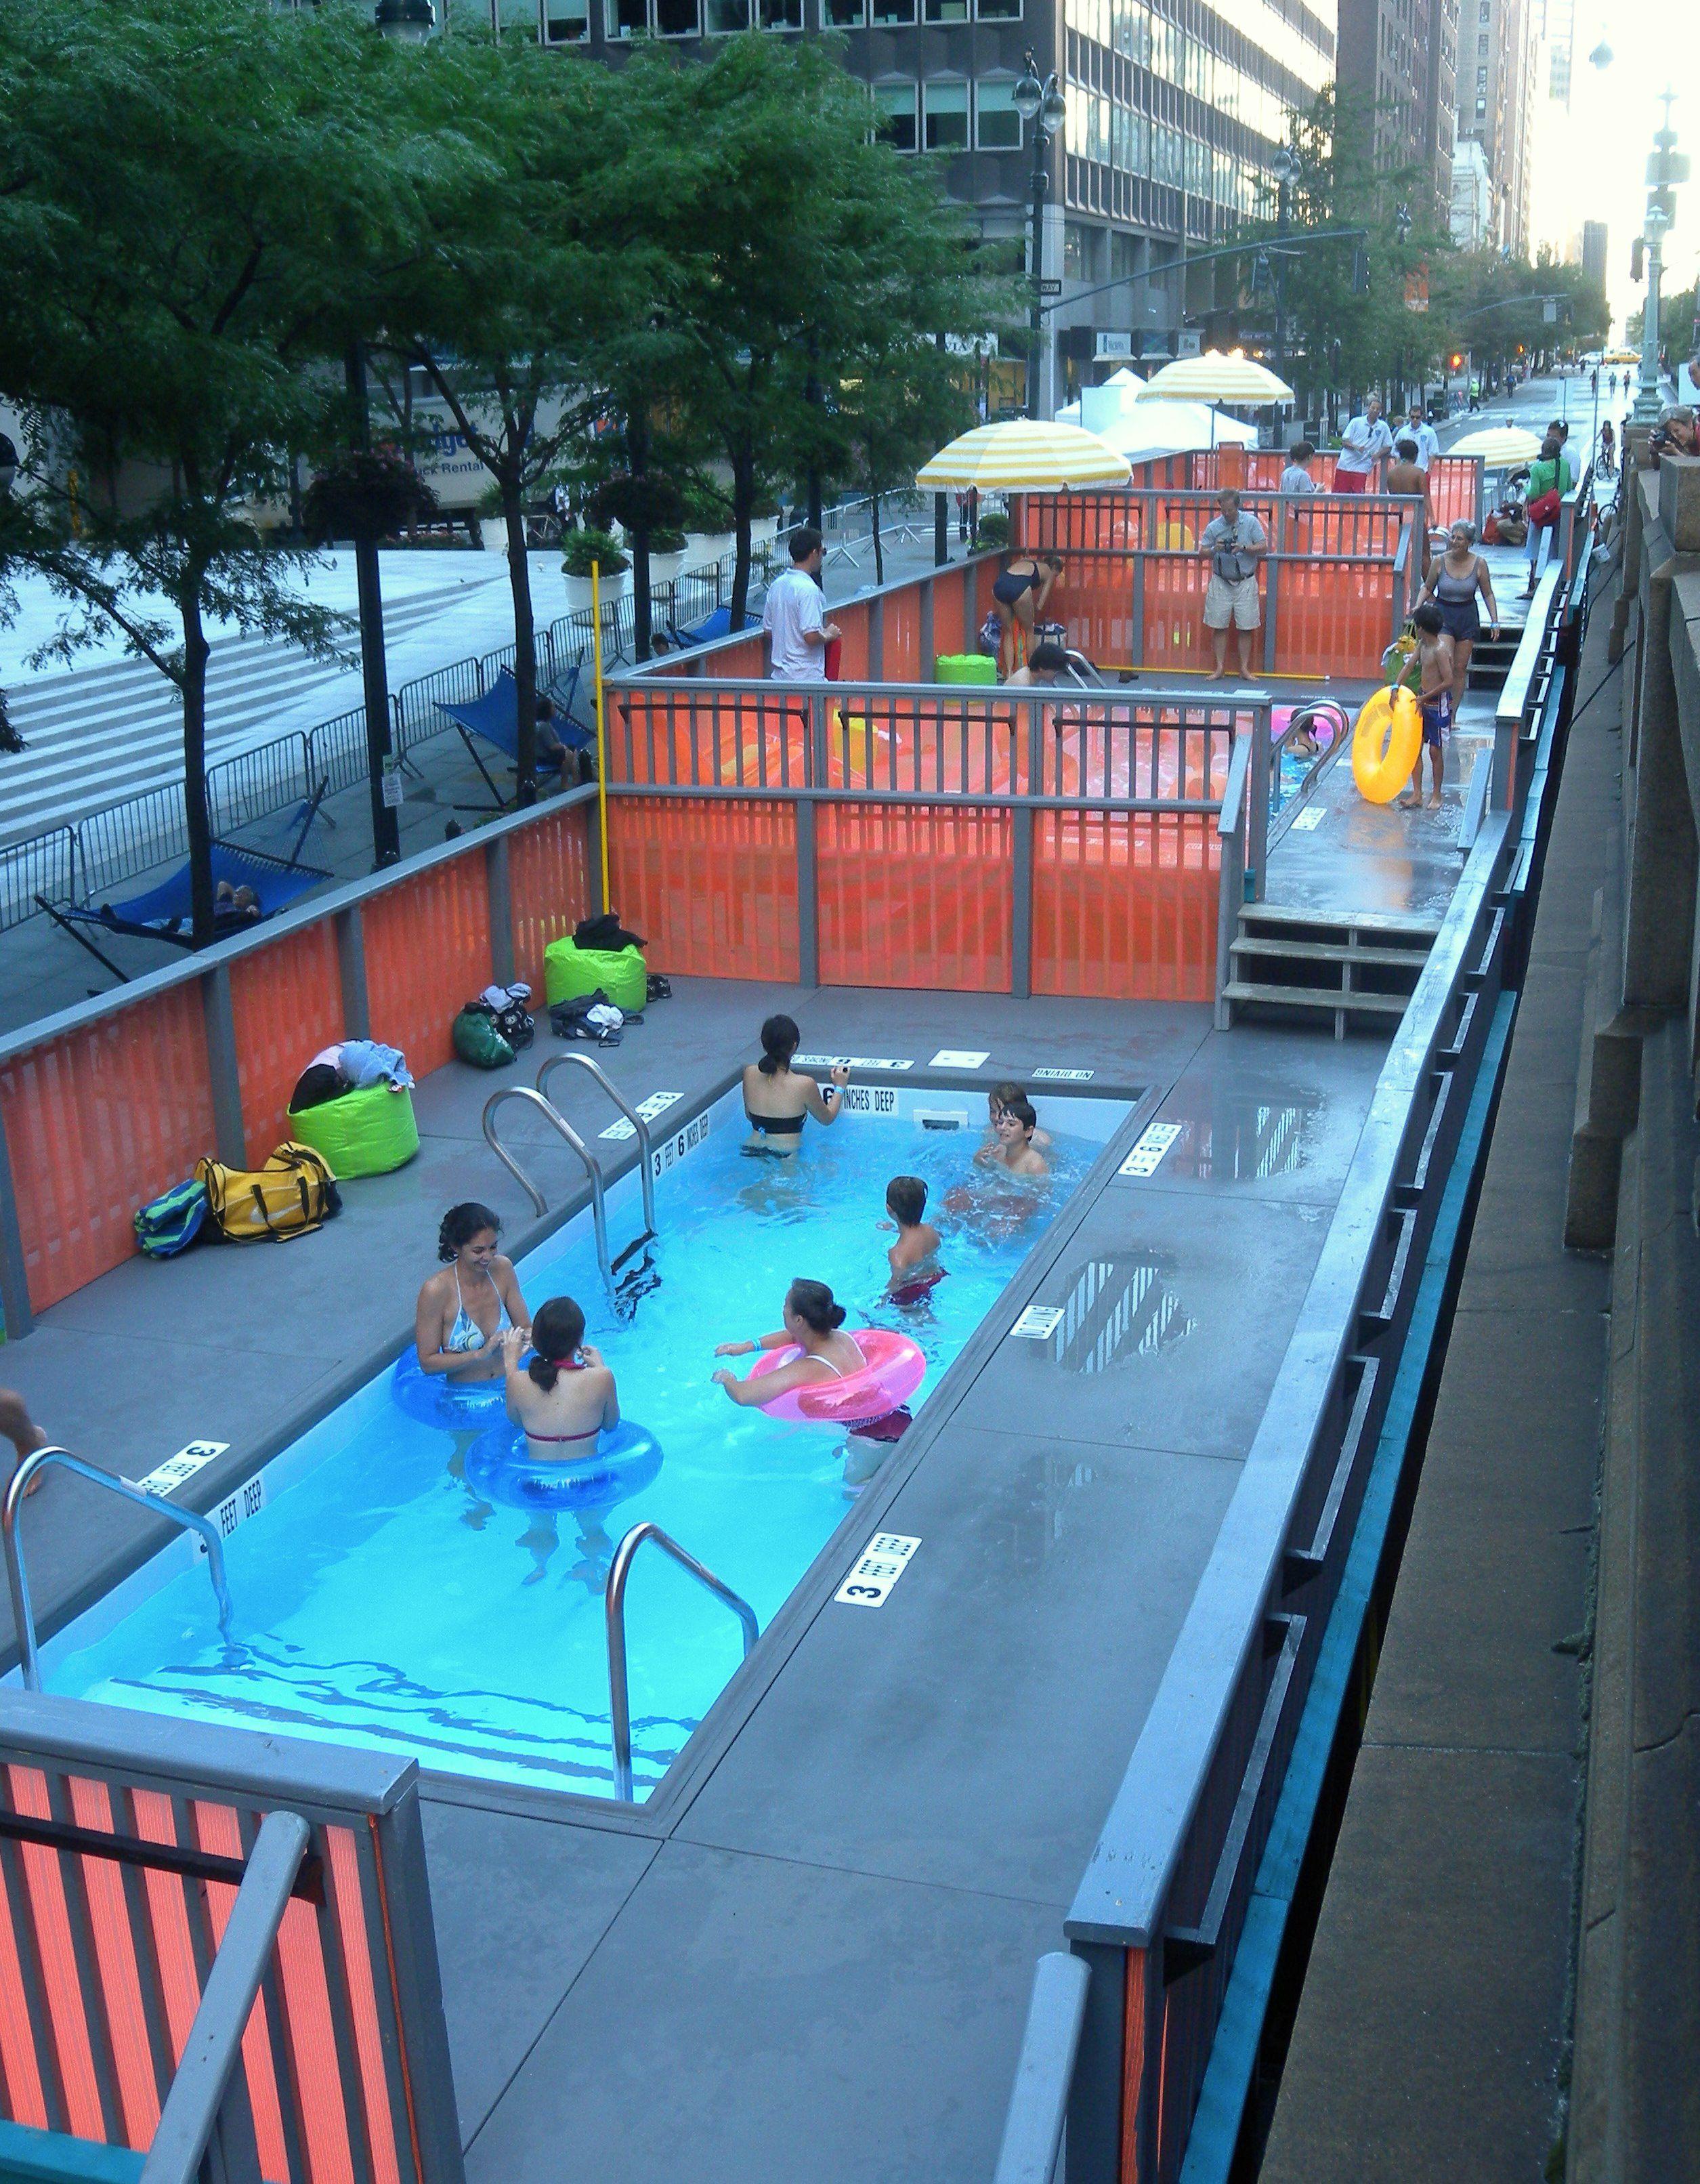 Repurposed dumpster pools in nyc dream swimming pools for Repurposed swimming pool